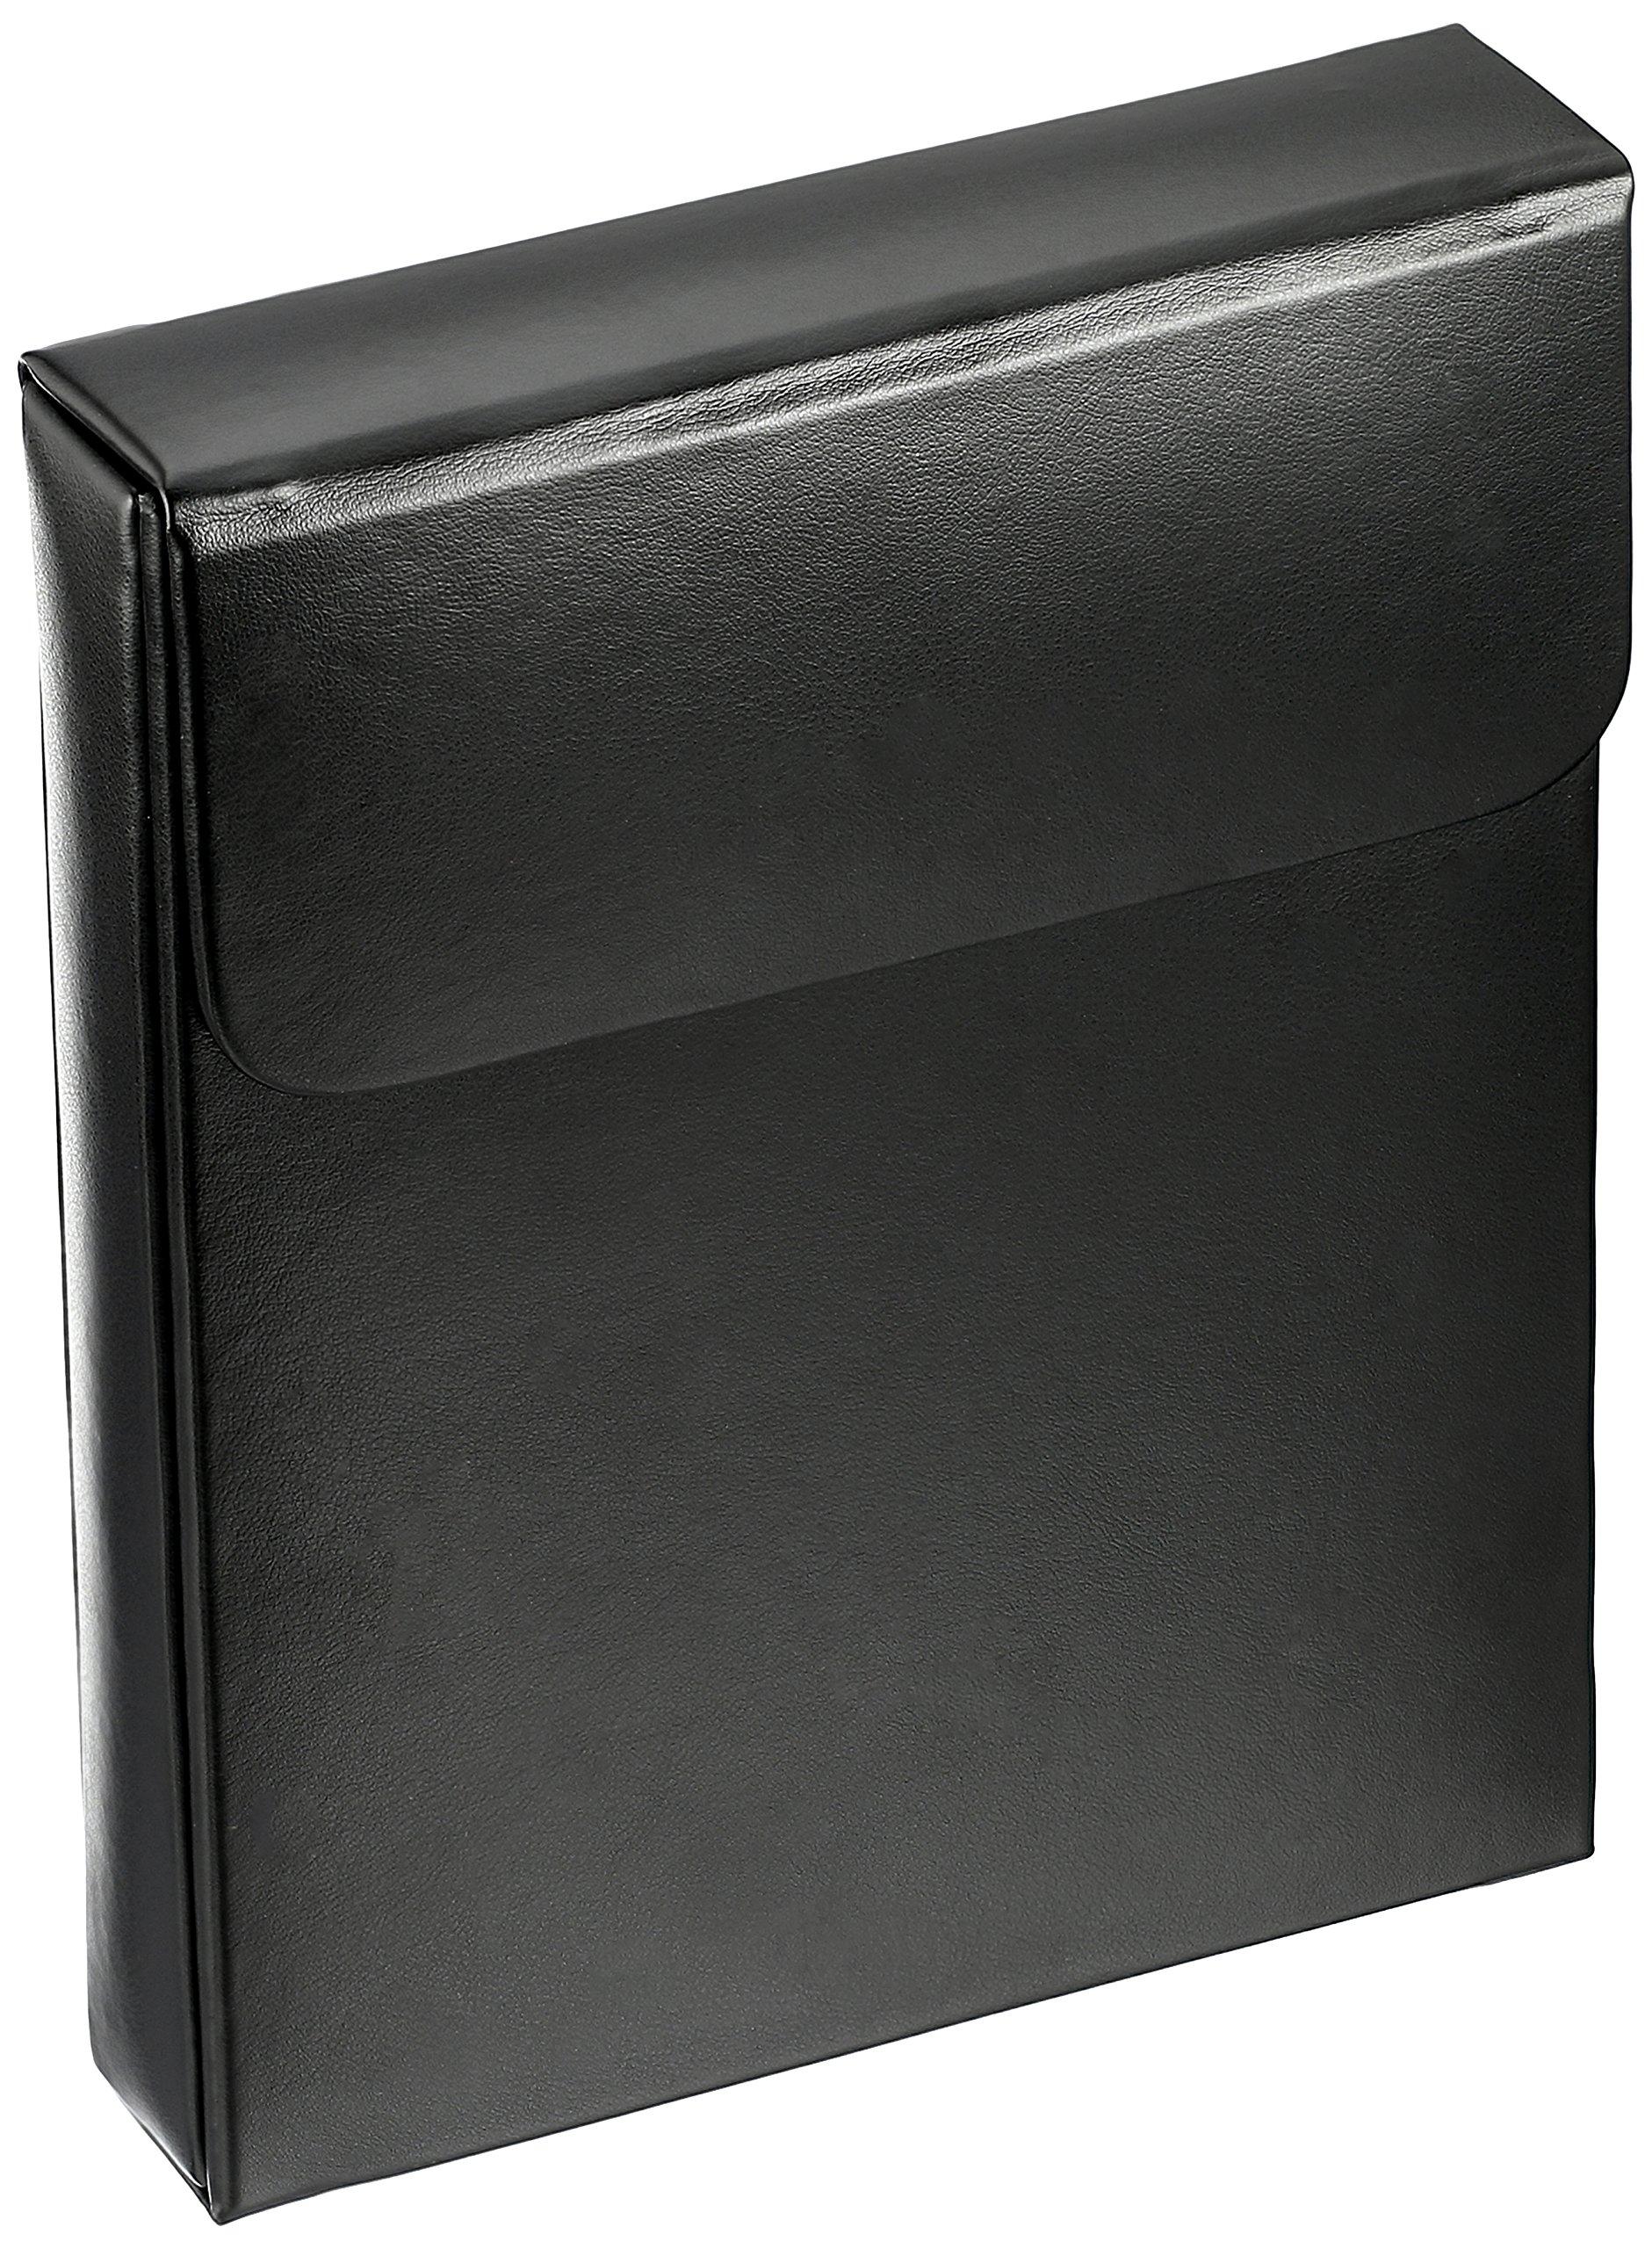 WOLF 99504 Heritage 2 Piece Watch Box, Black